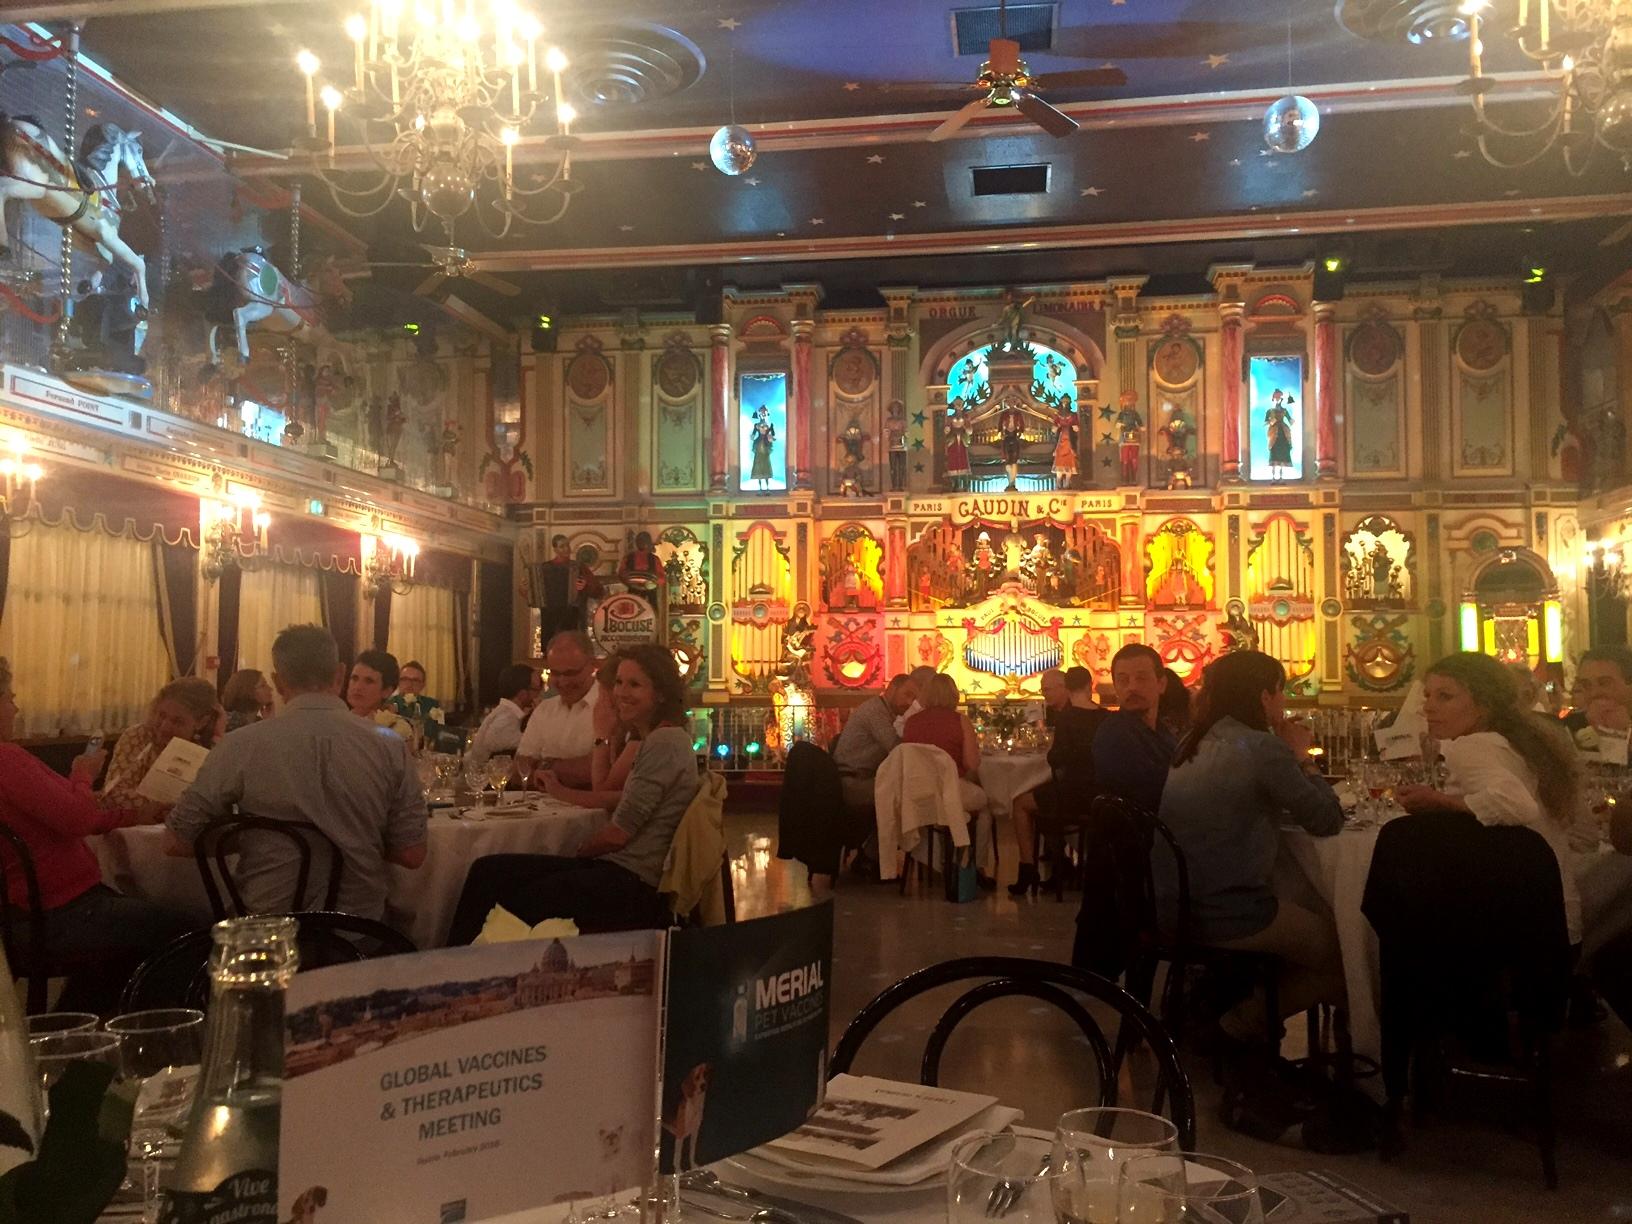 Auberge de Collonges - Bocuse restaurant - Customer dinner - 2008